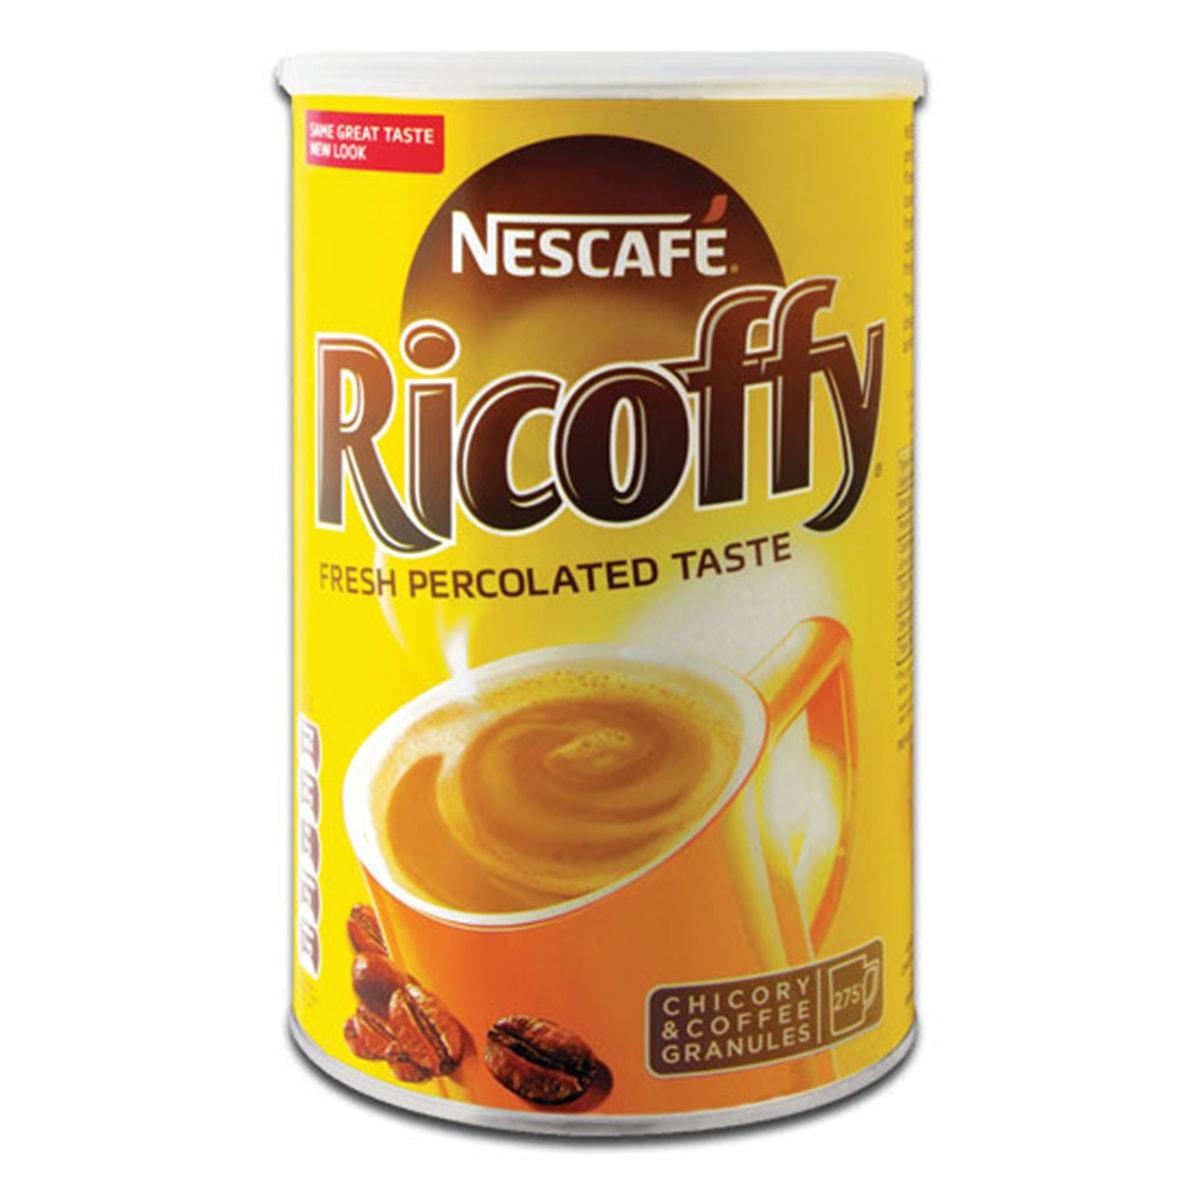 Buy Nestle Nescafe Ricoffy (Fresh Percolated Taste) - 250 gm